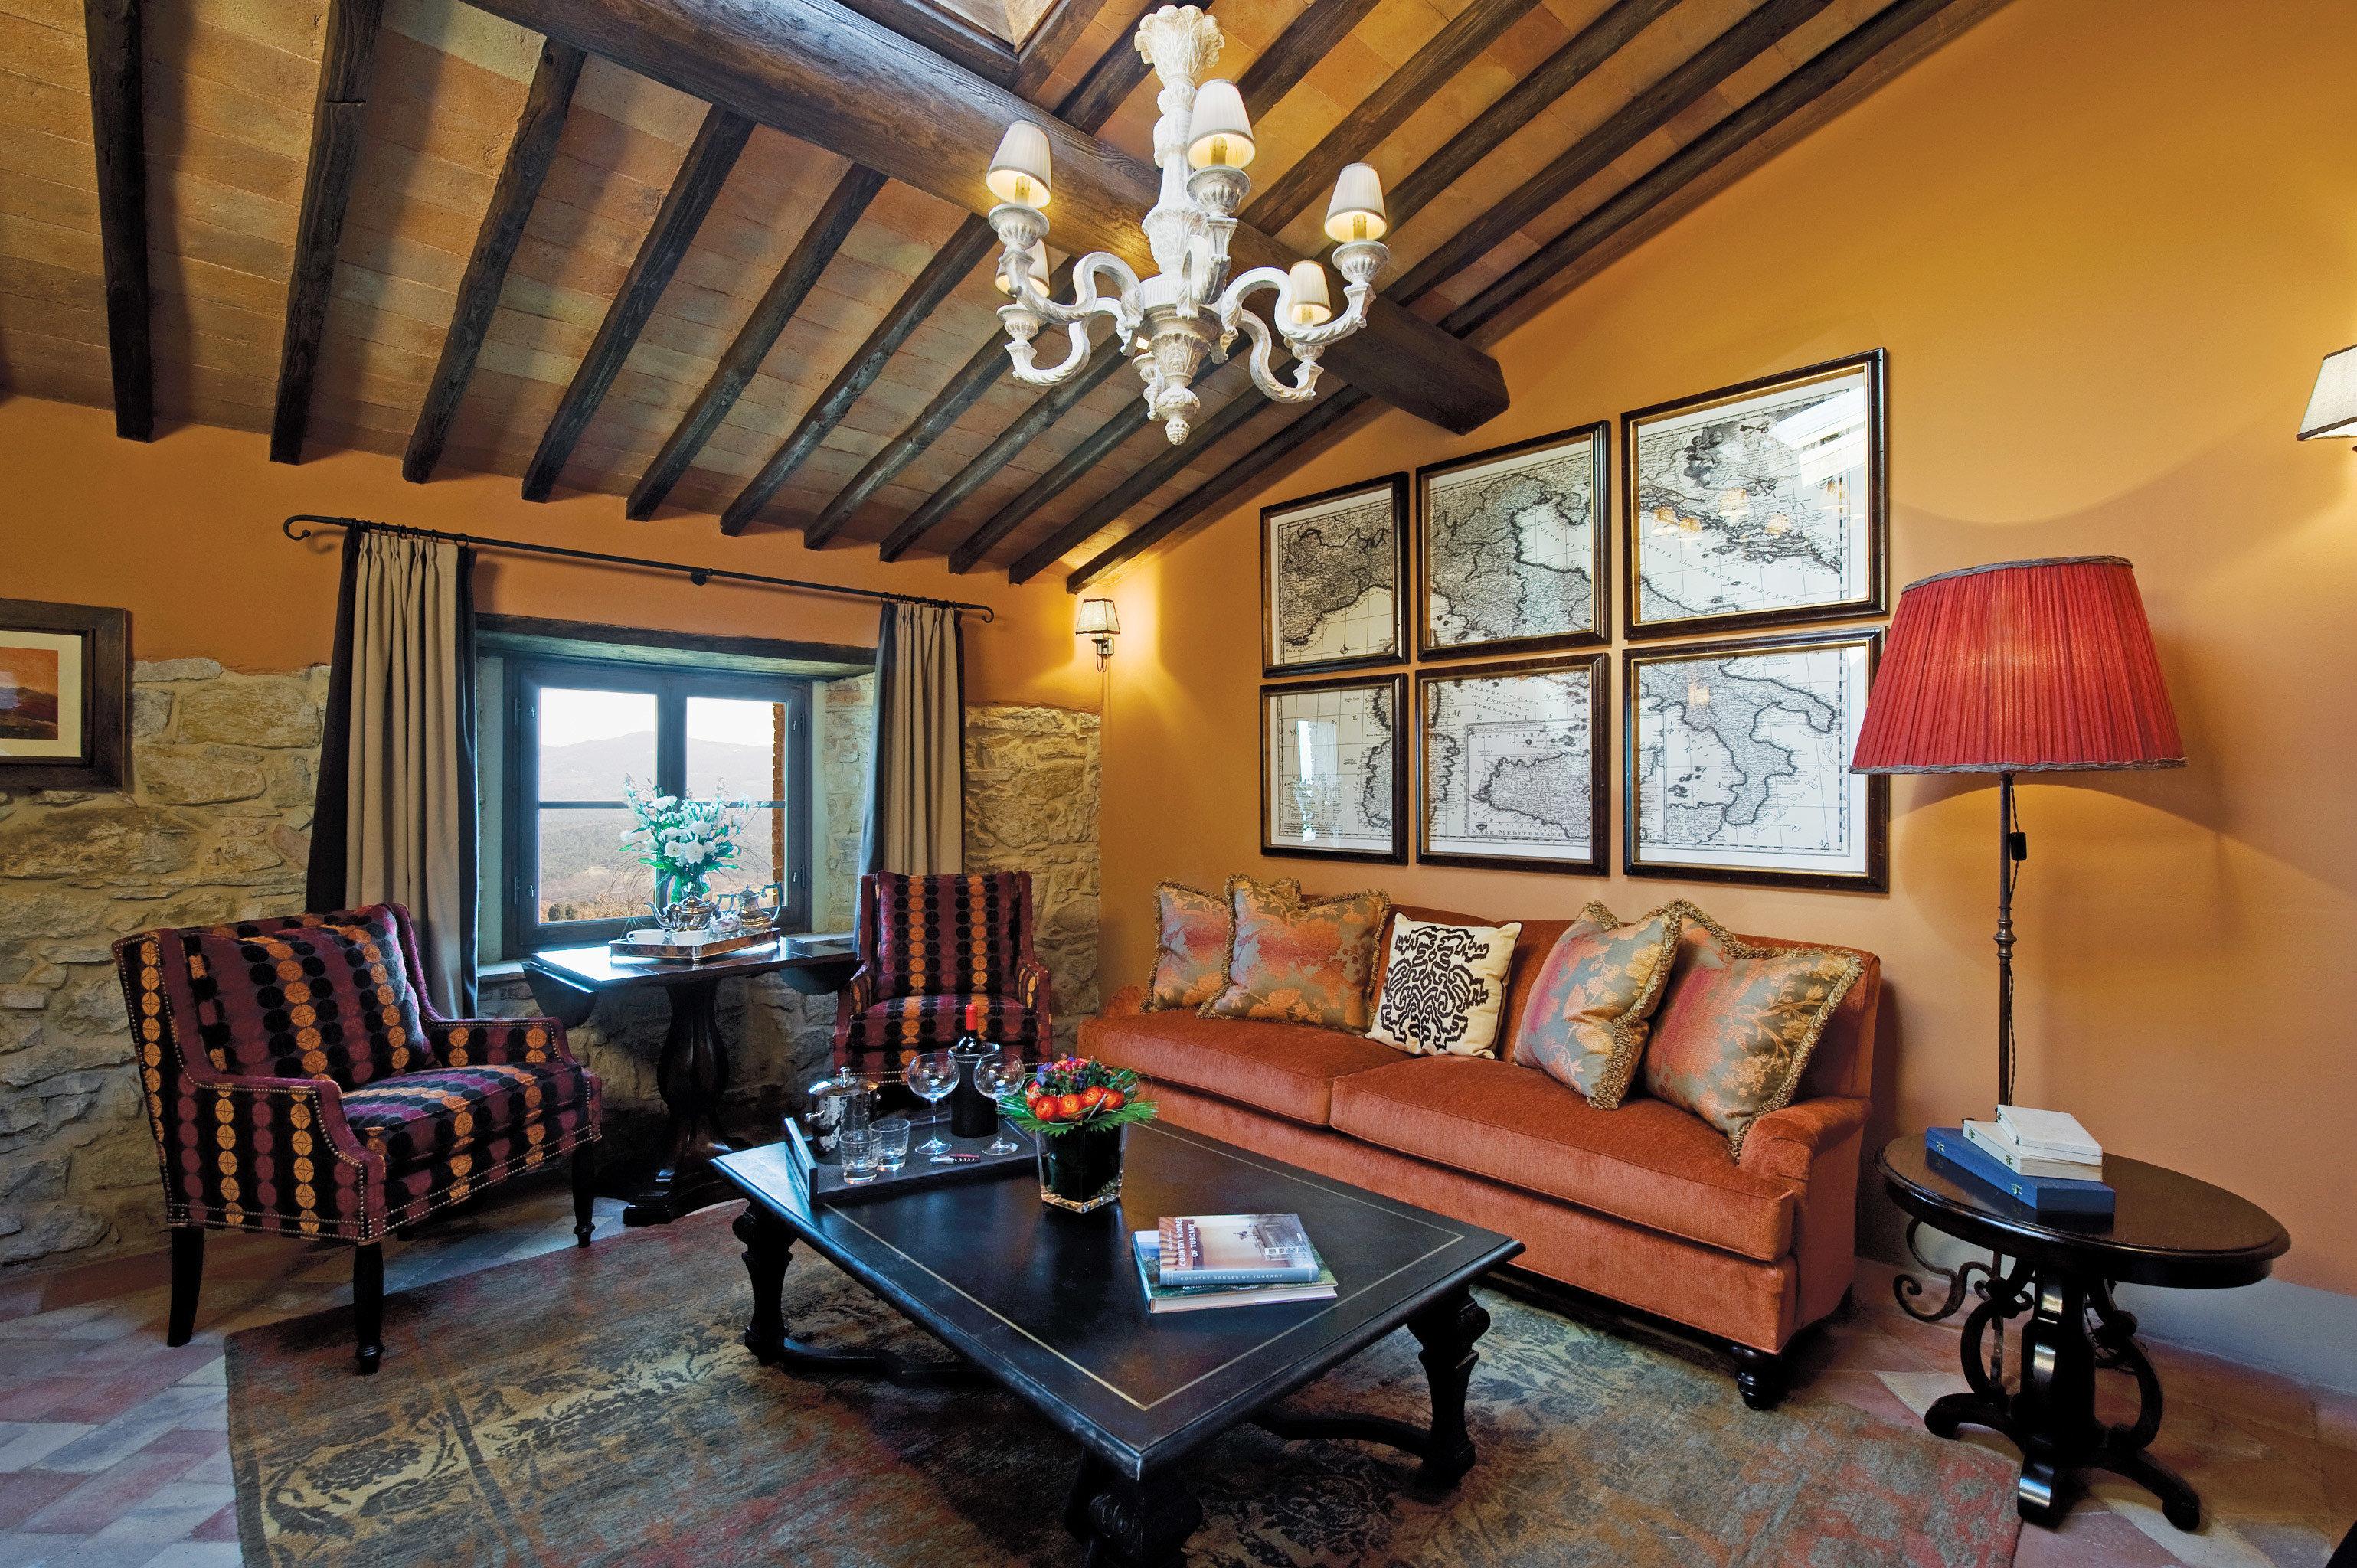 Cultural Romance property living room recreation room home cottage Villa farmhouse